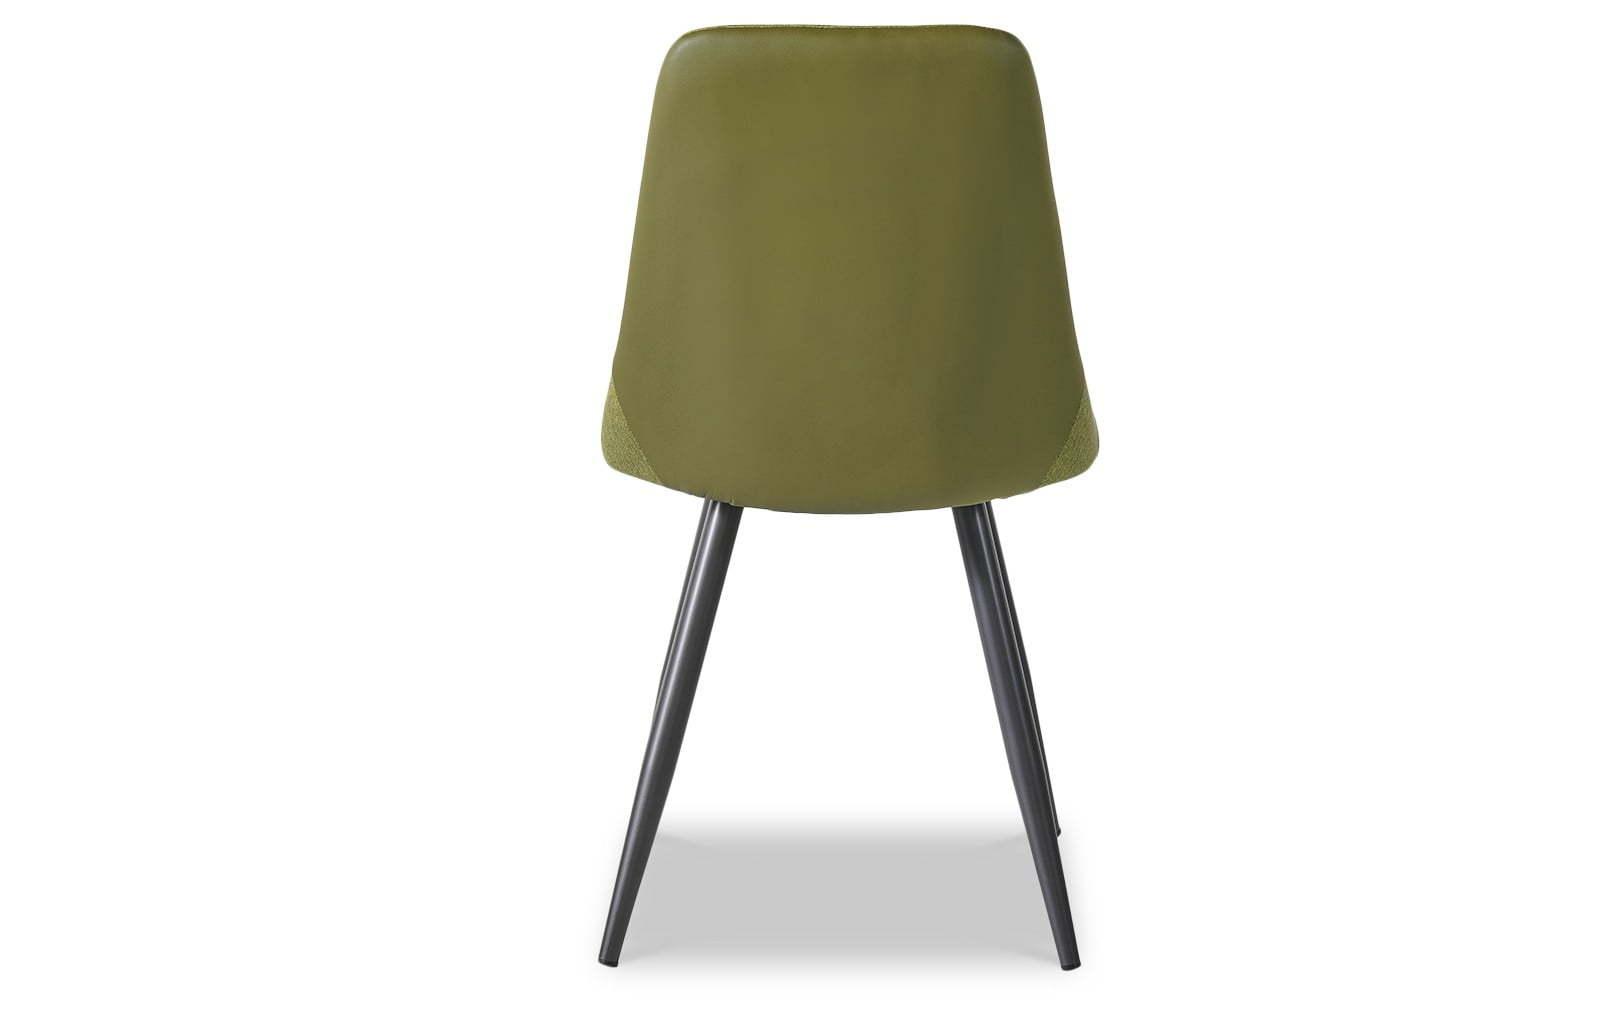 Стул ESF SKY8764 зеленый/серый